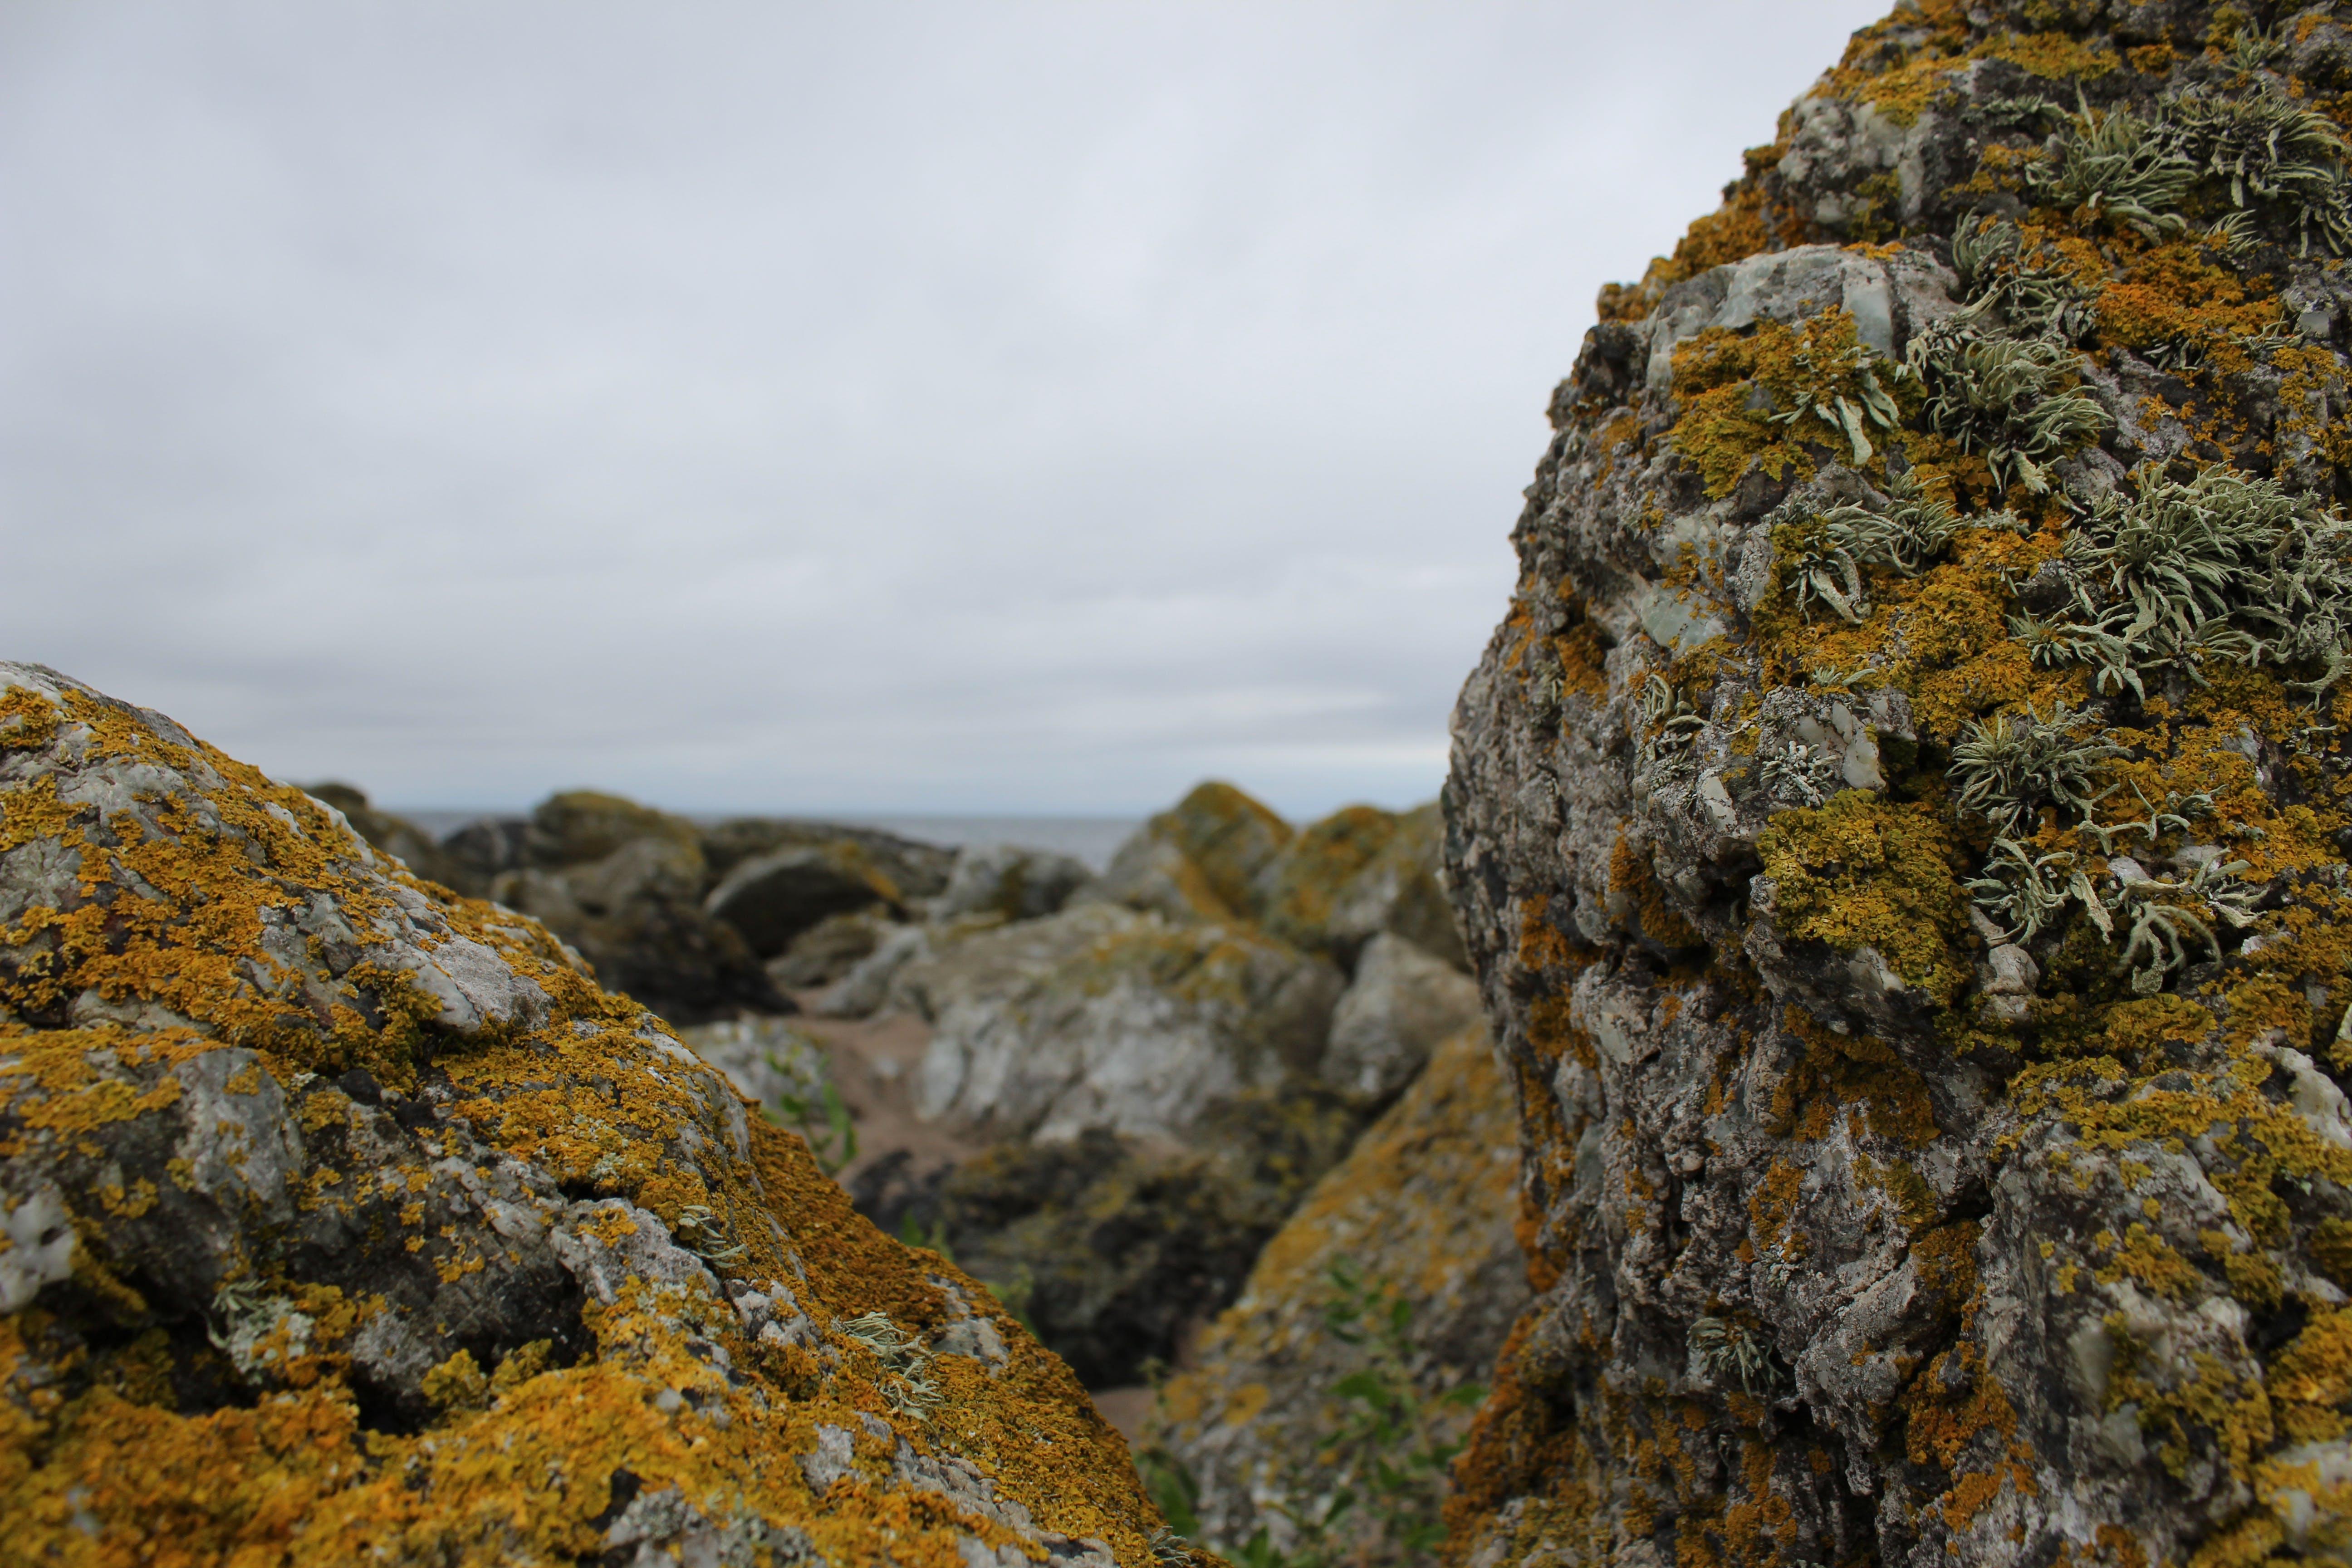 Free stock photo of clouds, looking between the rocks, Mossy rocks, orange